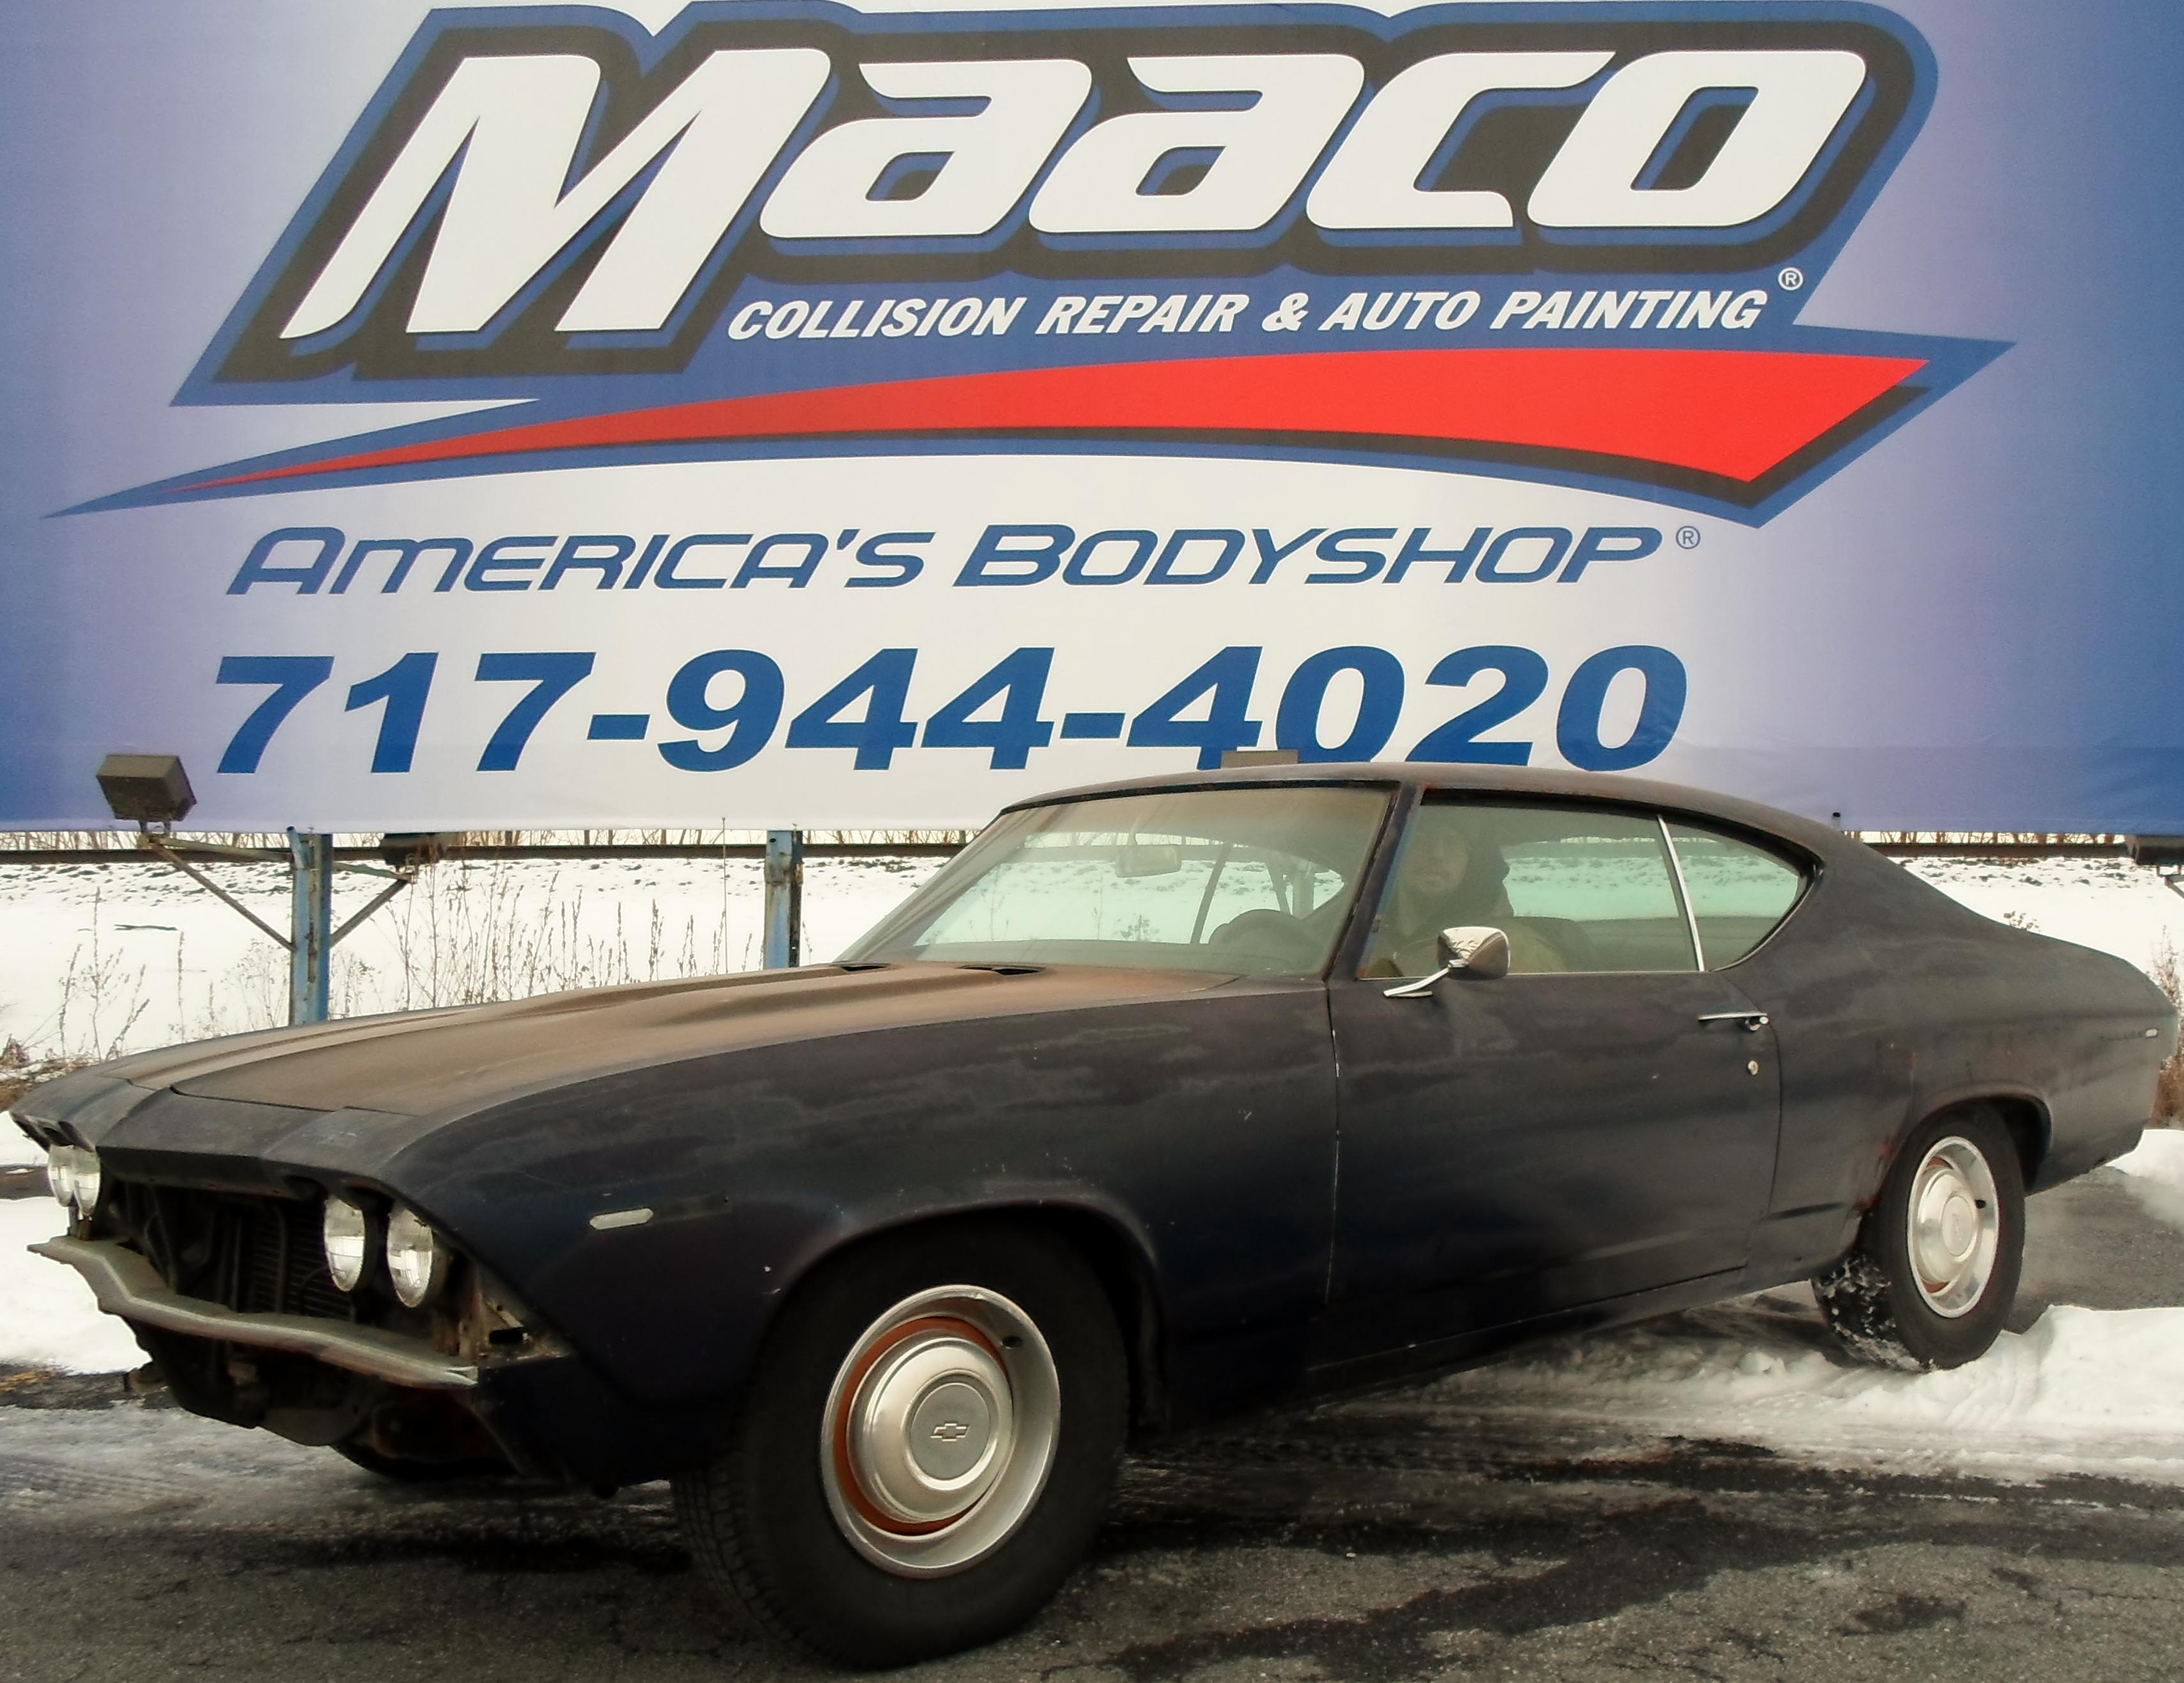 Maaco Collision Repair & Auto Painting image 15